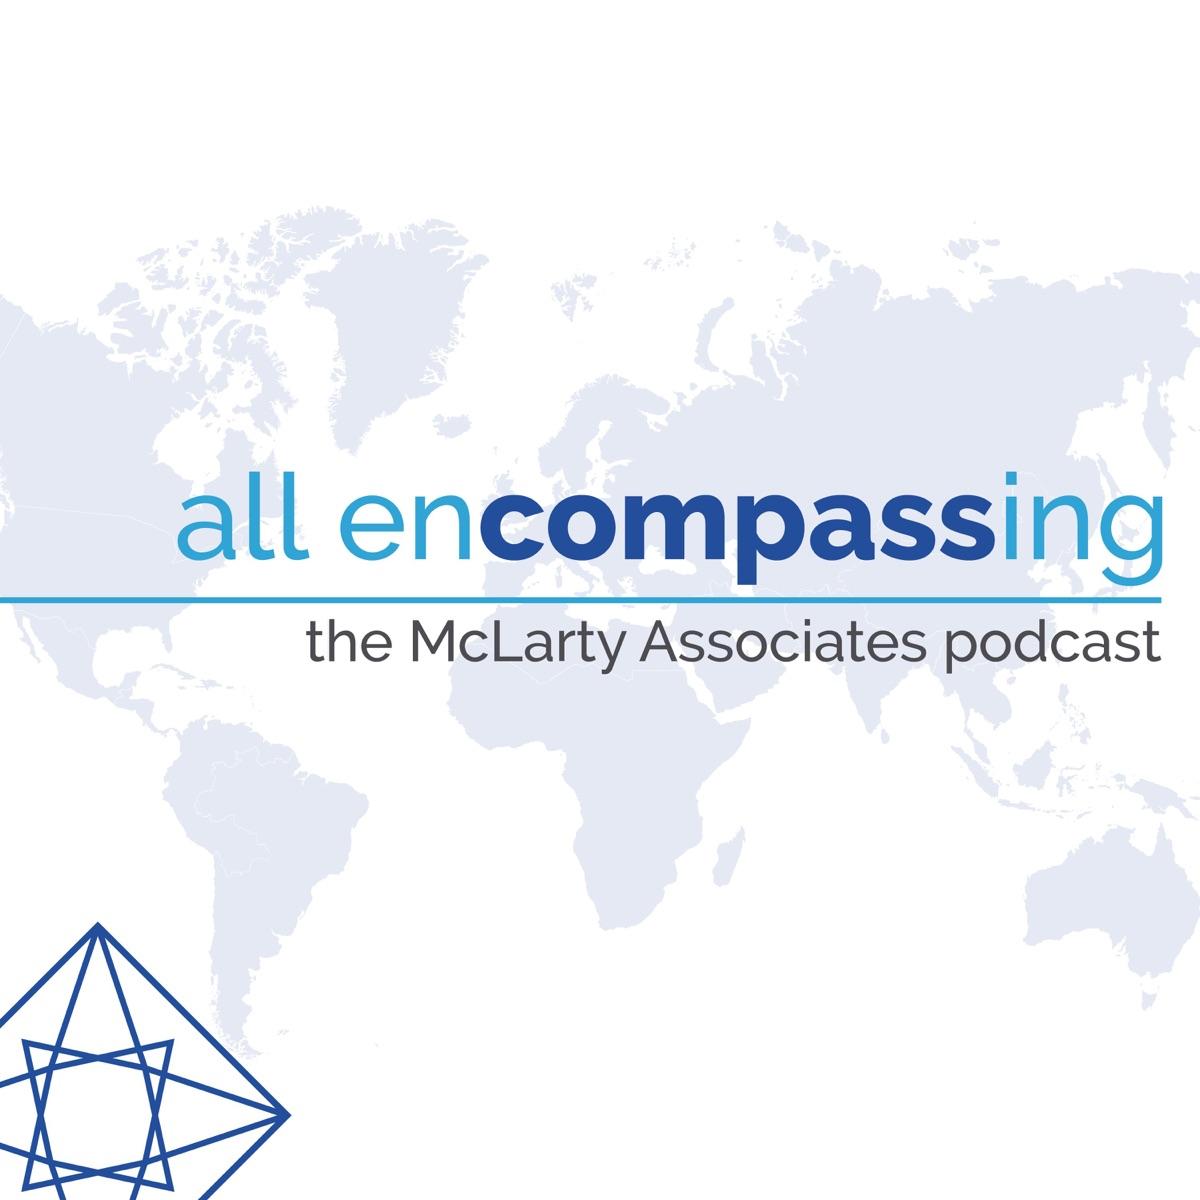 All Encompassing, the McLarty Associates podcast